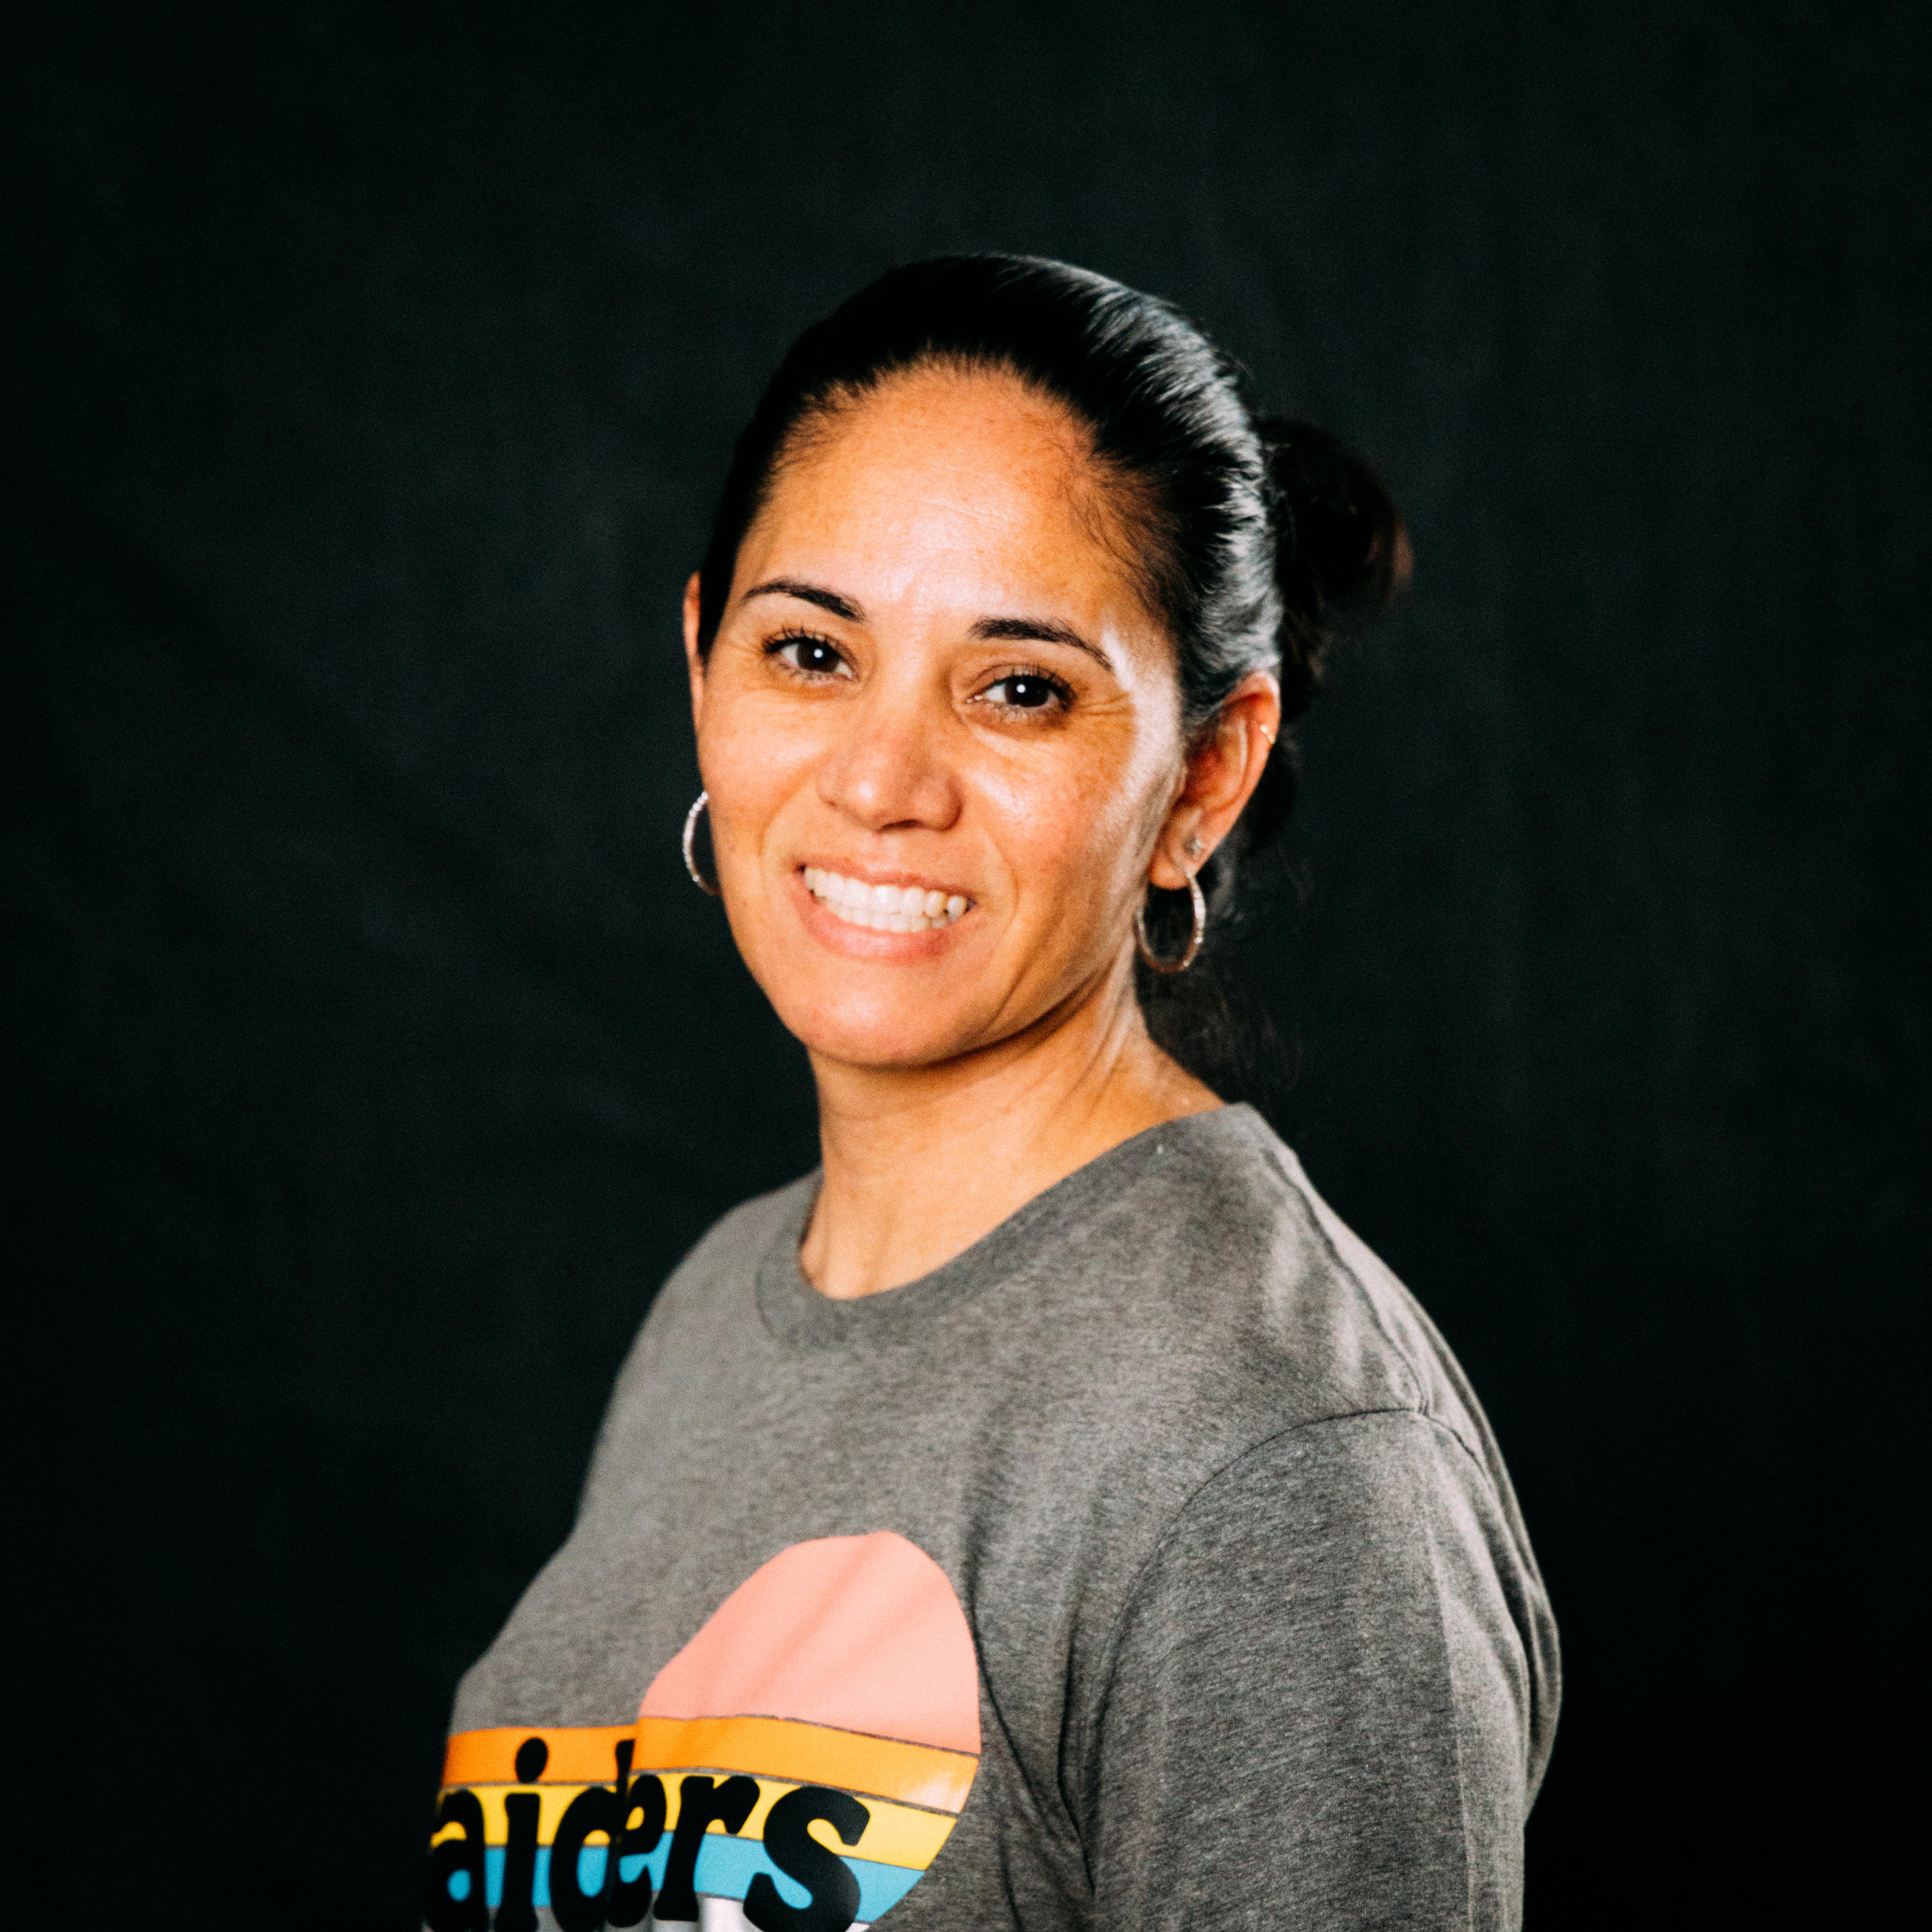 Ilianna Garcia